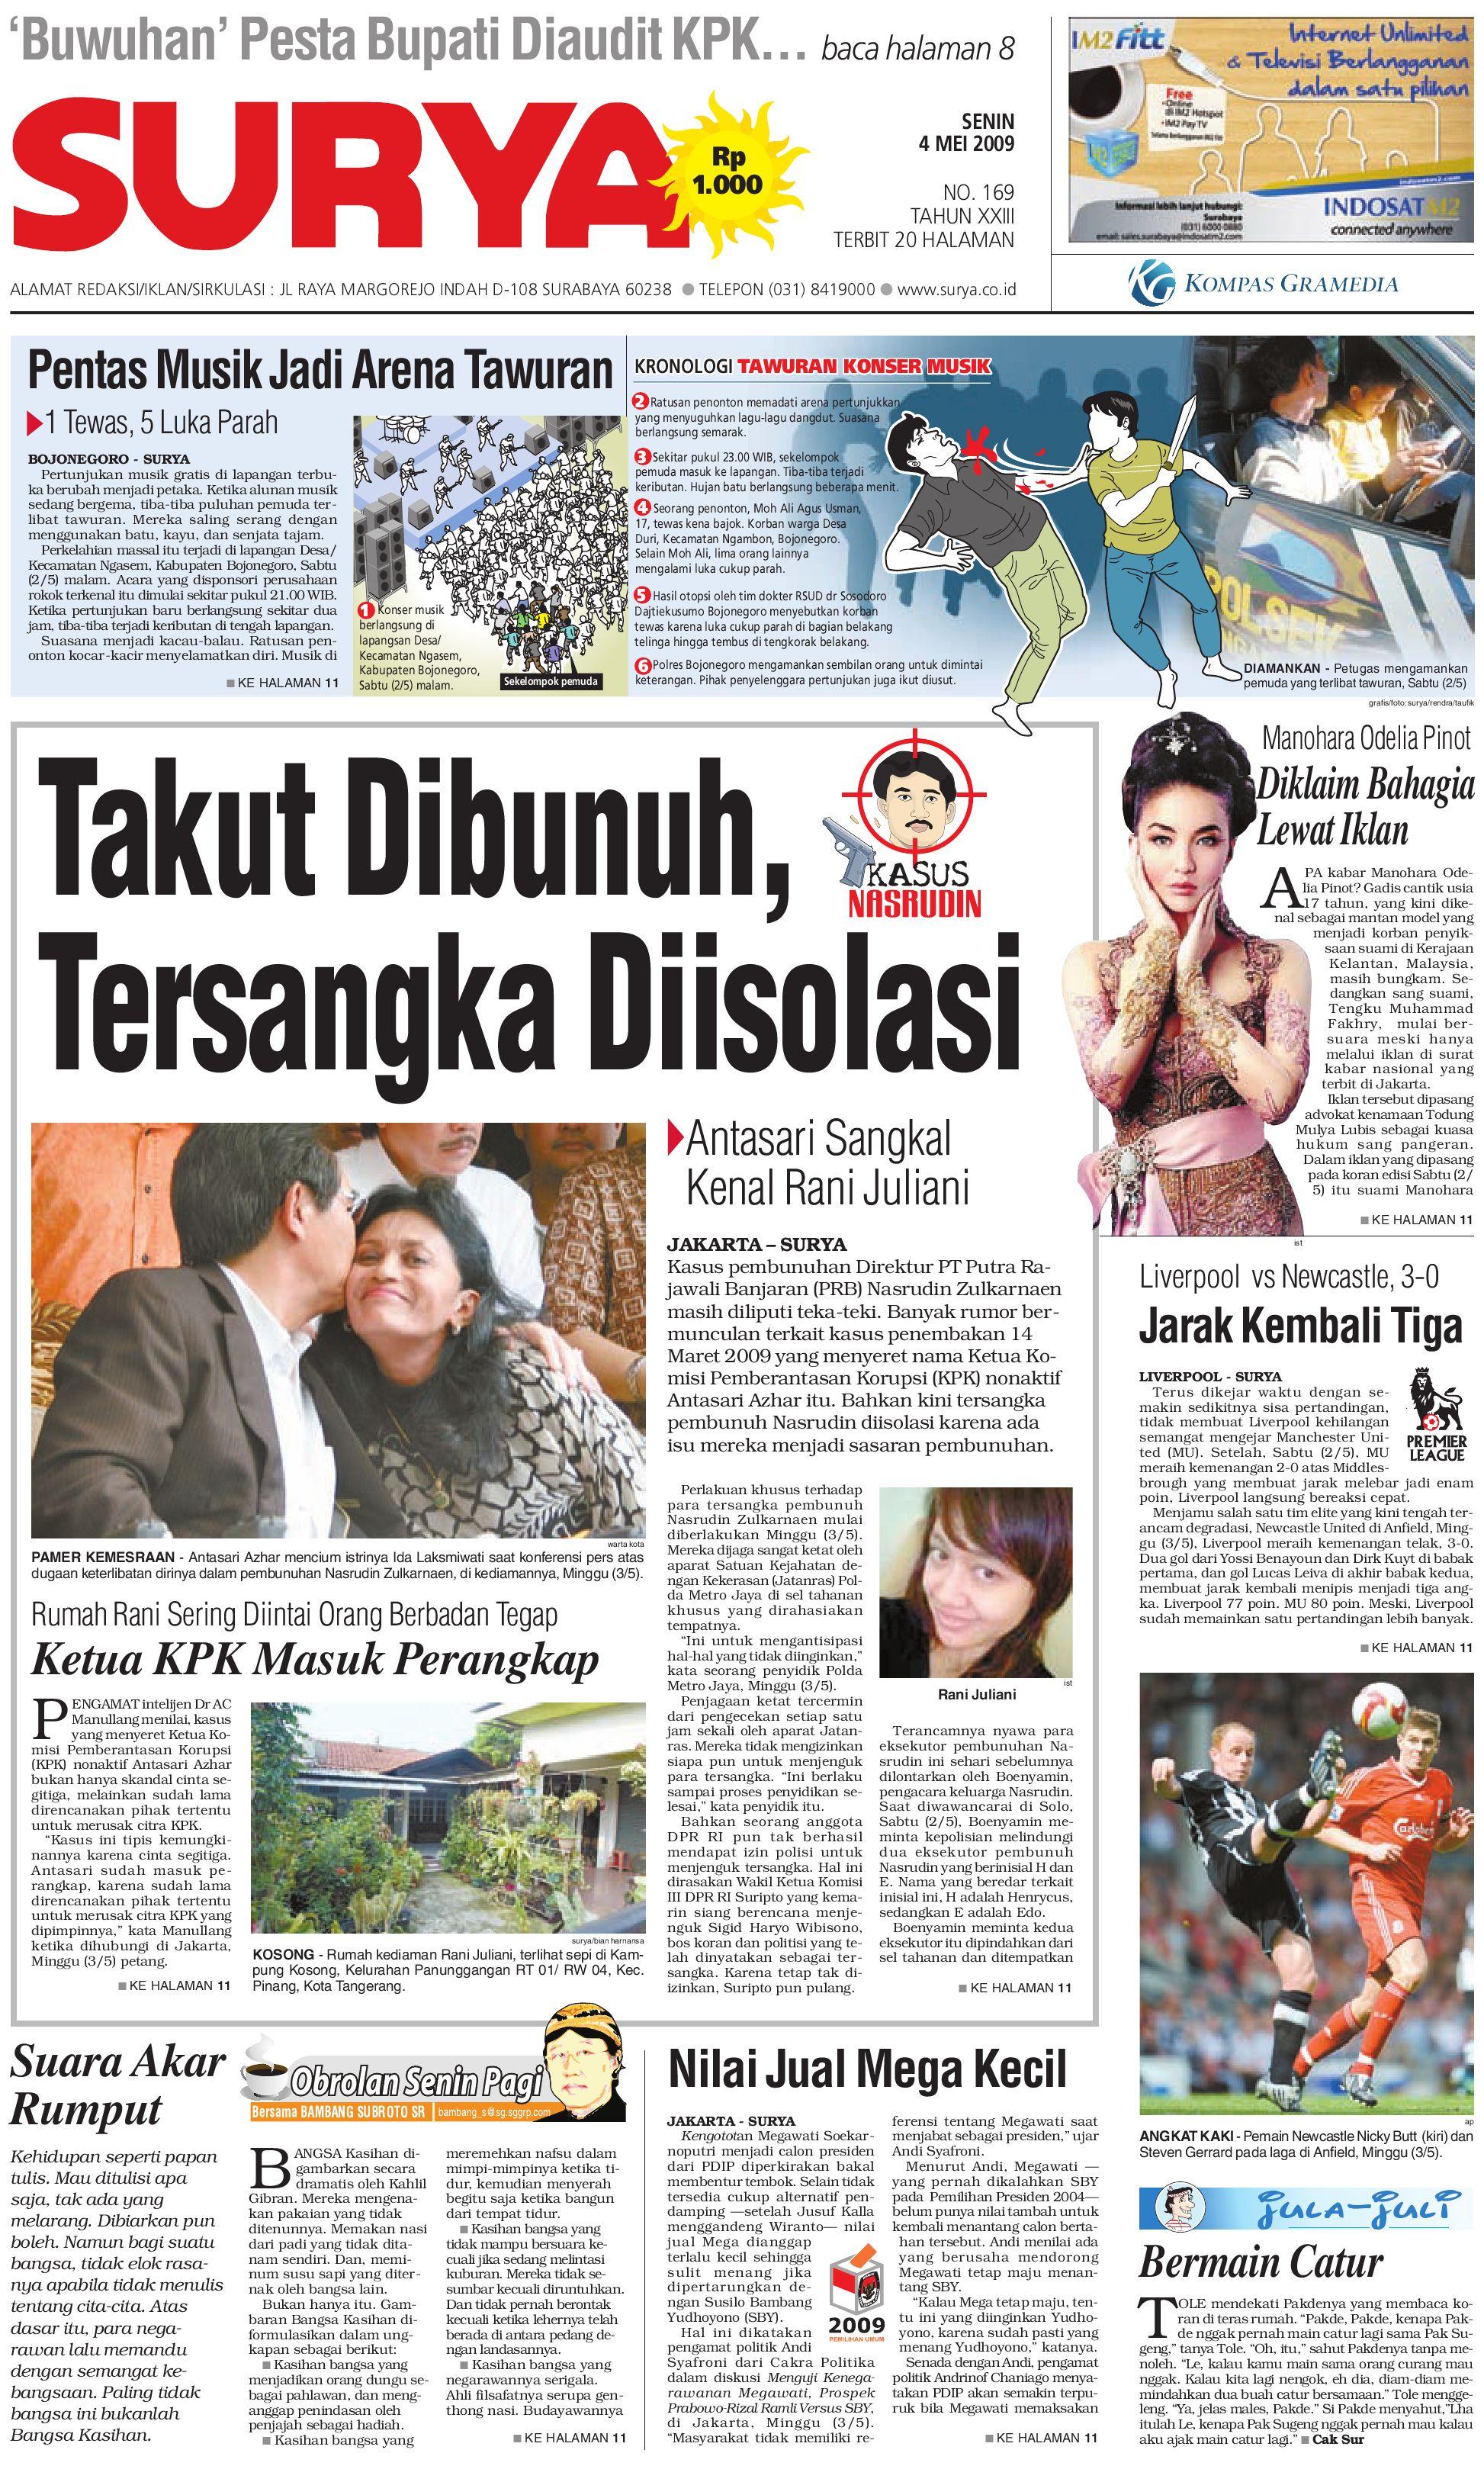 Surya Edisi Cetak 04 Mei 2009 By Harian Issuu Produk Ukm Bumn Chesse Pie Khas Balikpapan